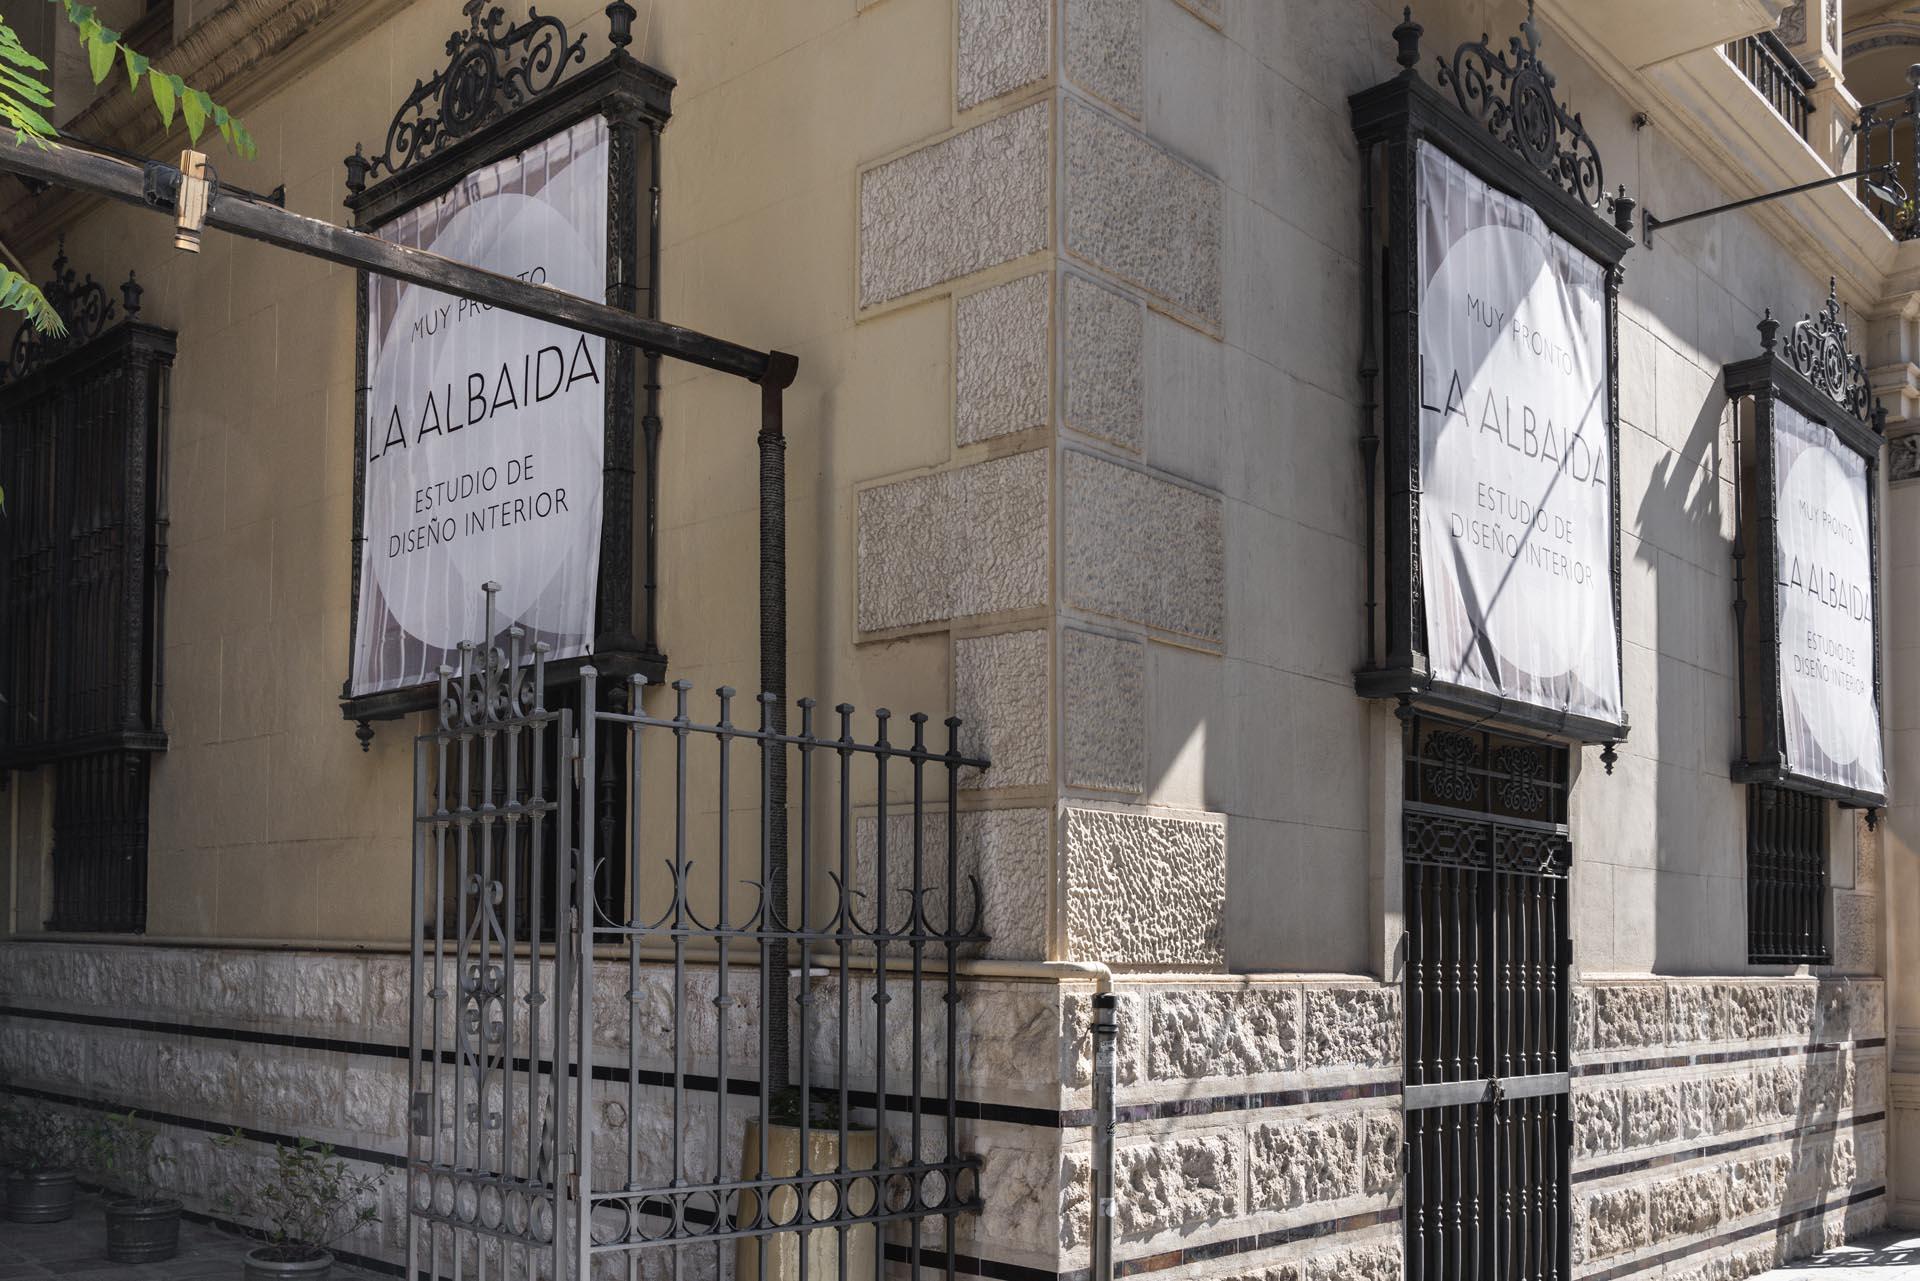 estudio interiorismo malaga La Albaida nuevo showroom fachada